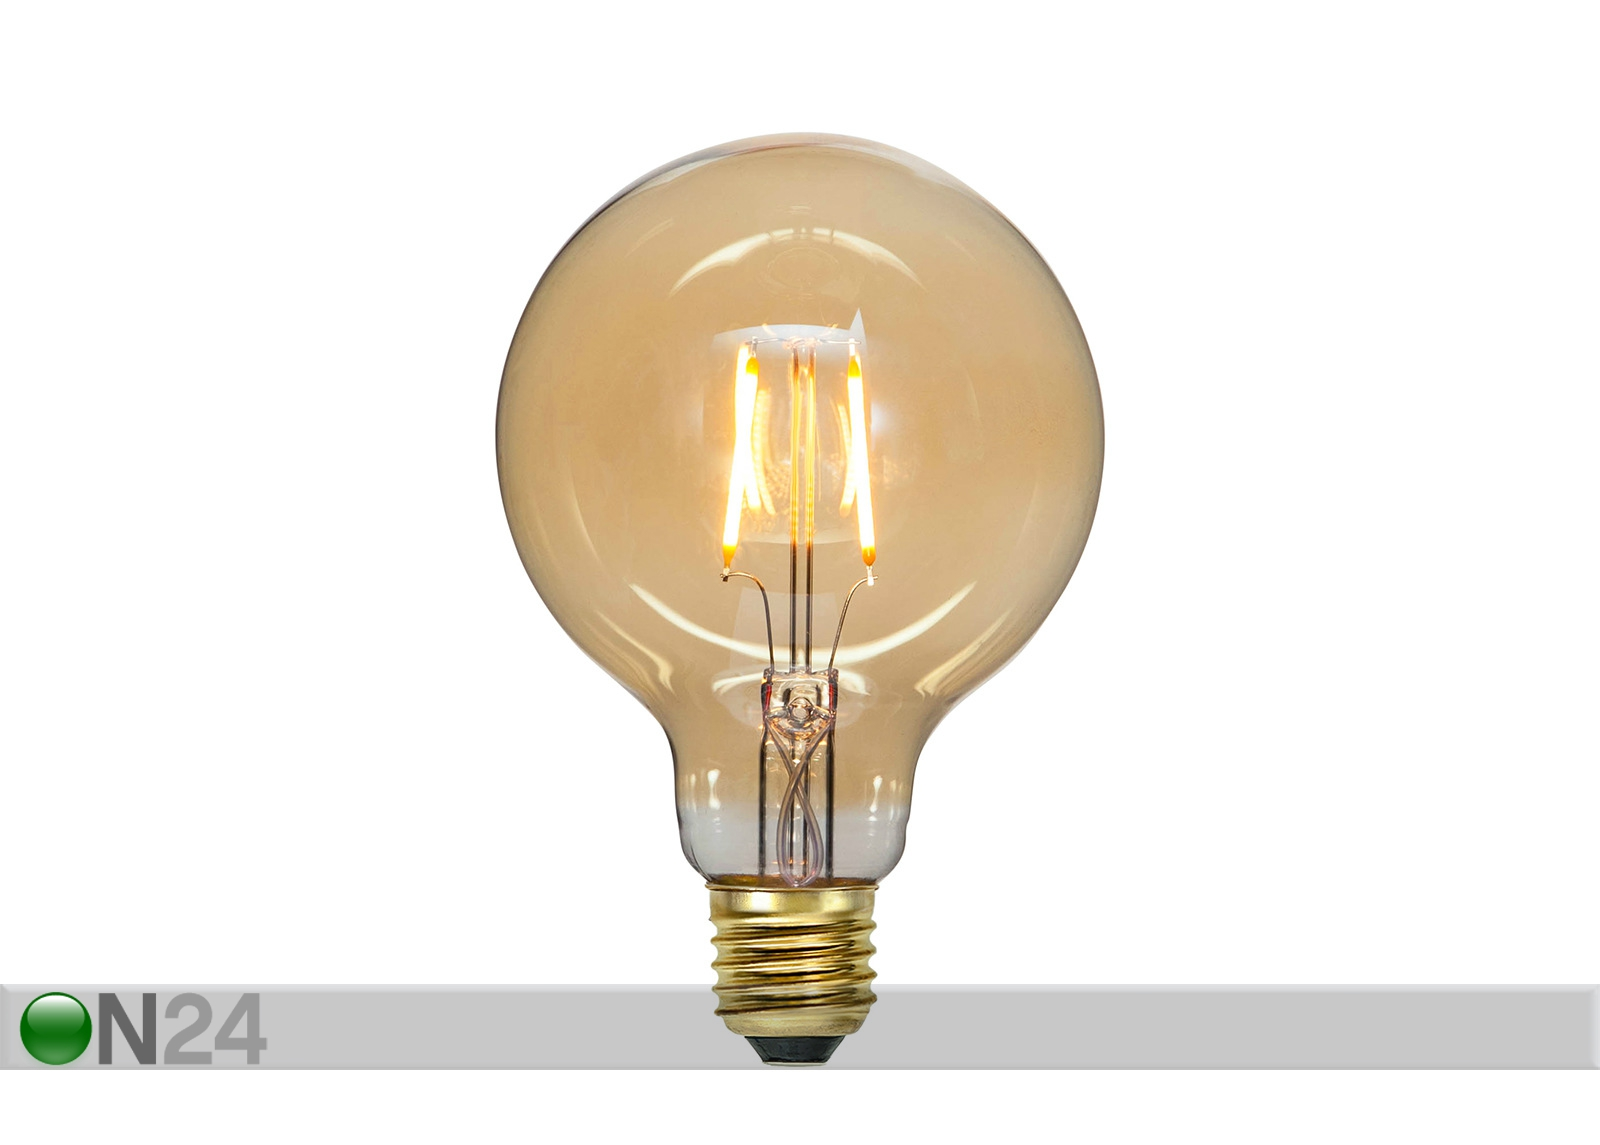 713261dac67 Dekoratiivne LED pirn E27 0,75 W AA-153733 - ON24 Sisustuskaubamaja